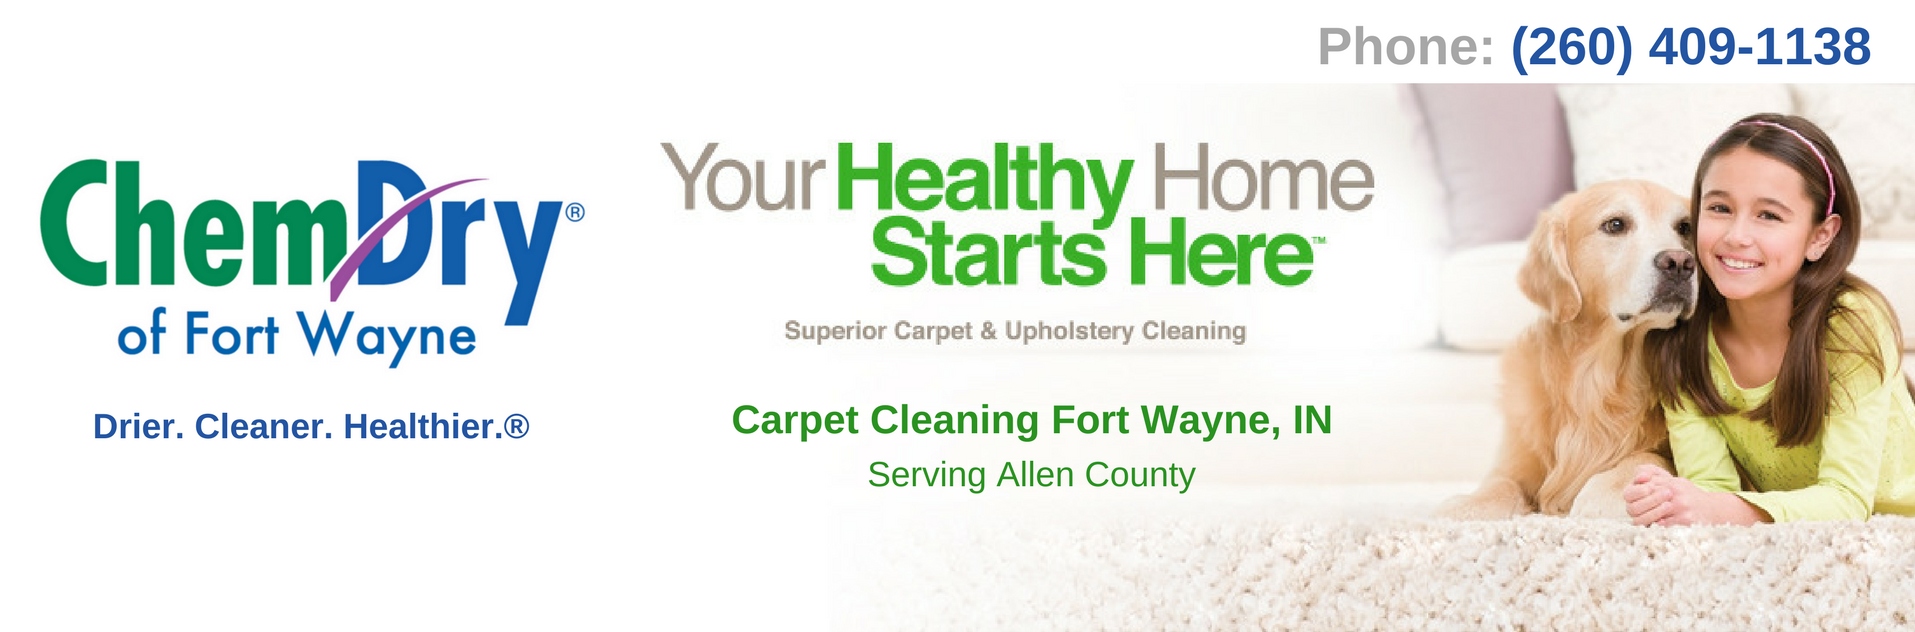 Fort Wayne Carpet Cleaning Blog Chem Dry Of Fort Wayne